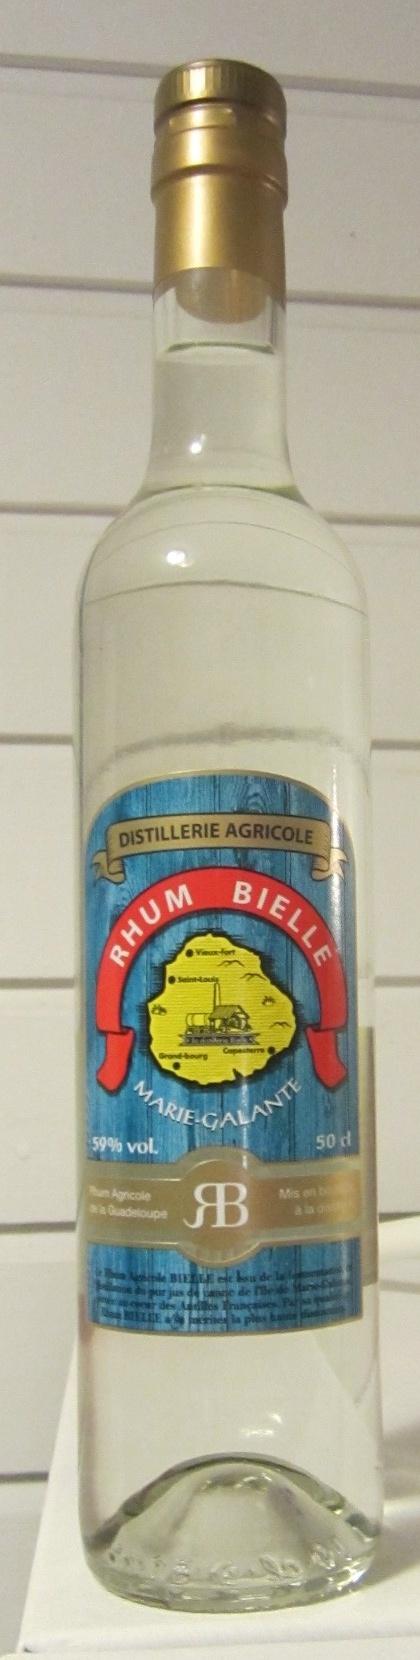 Rhum Bielle - Product